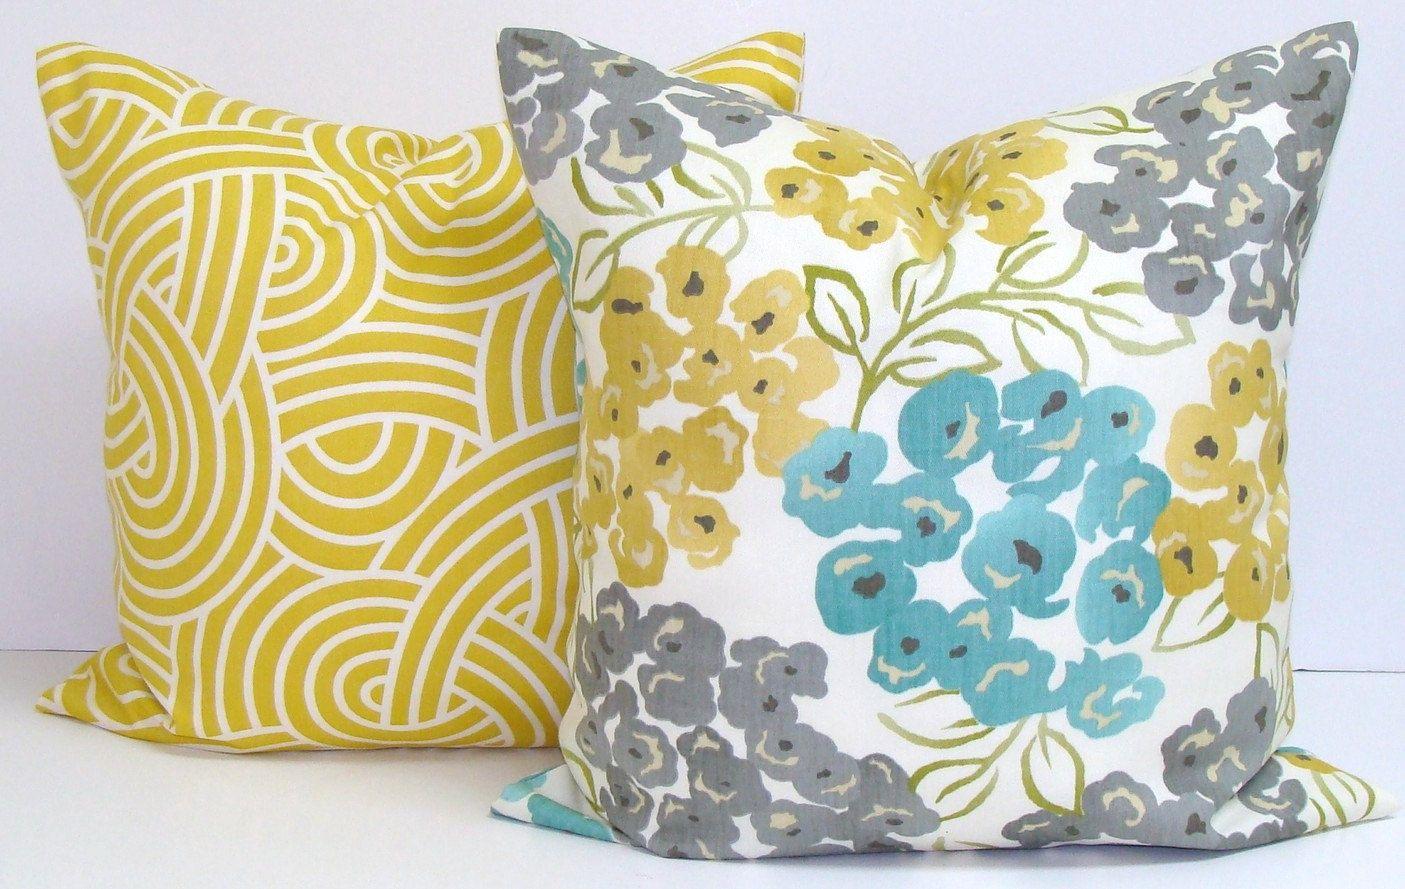 Teal Pillow Floral Pillow Cover Decorative Pillow